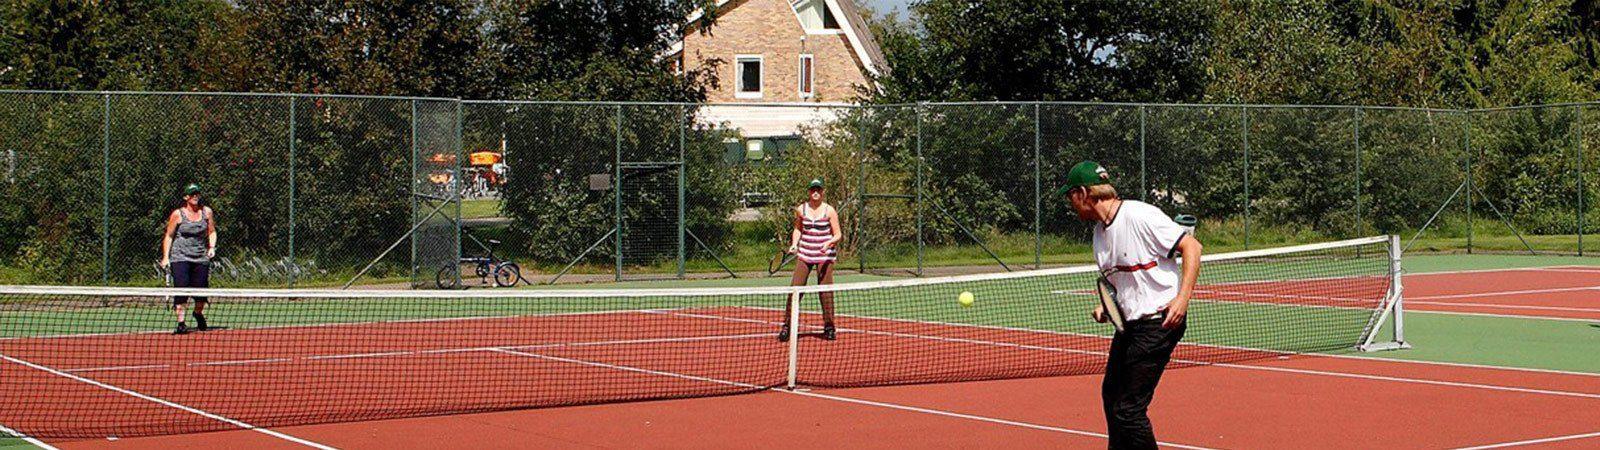 Tennisbanen | Vakantiepark Witterzomer